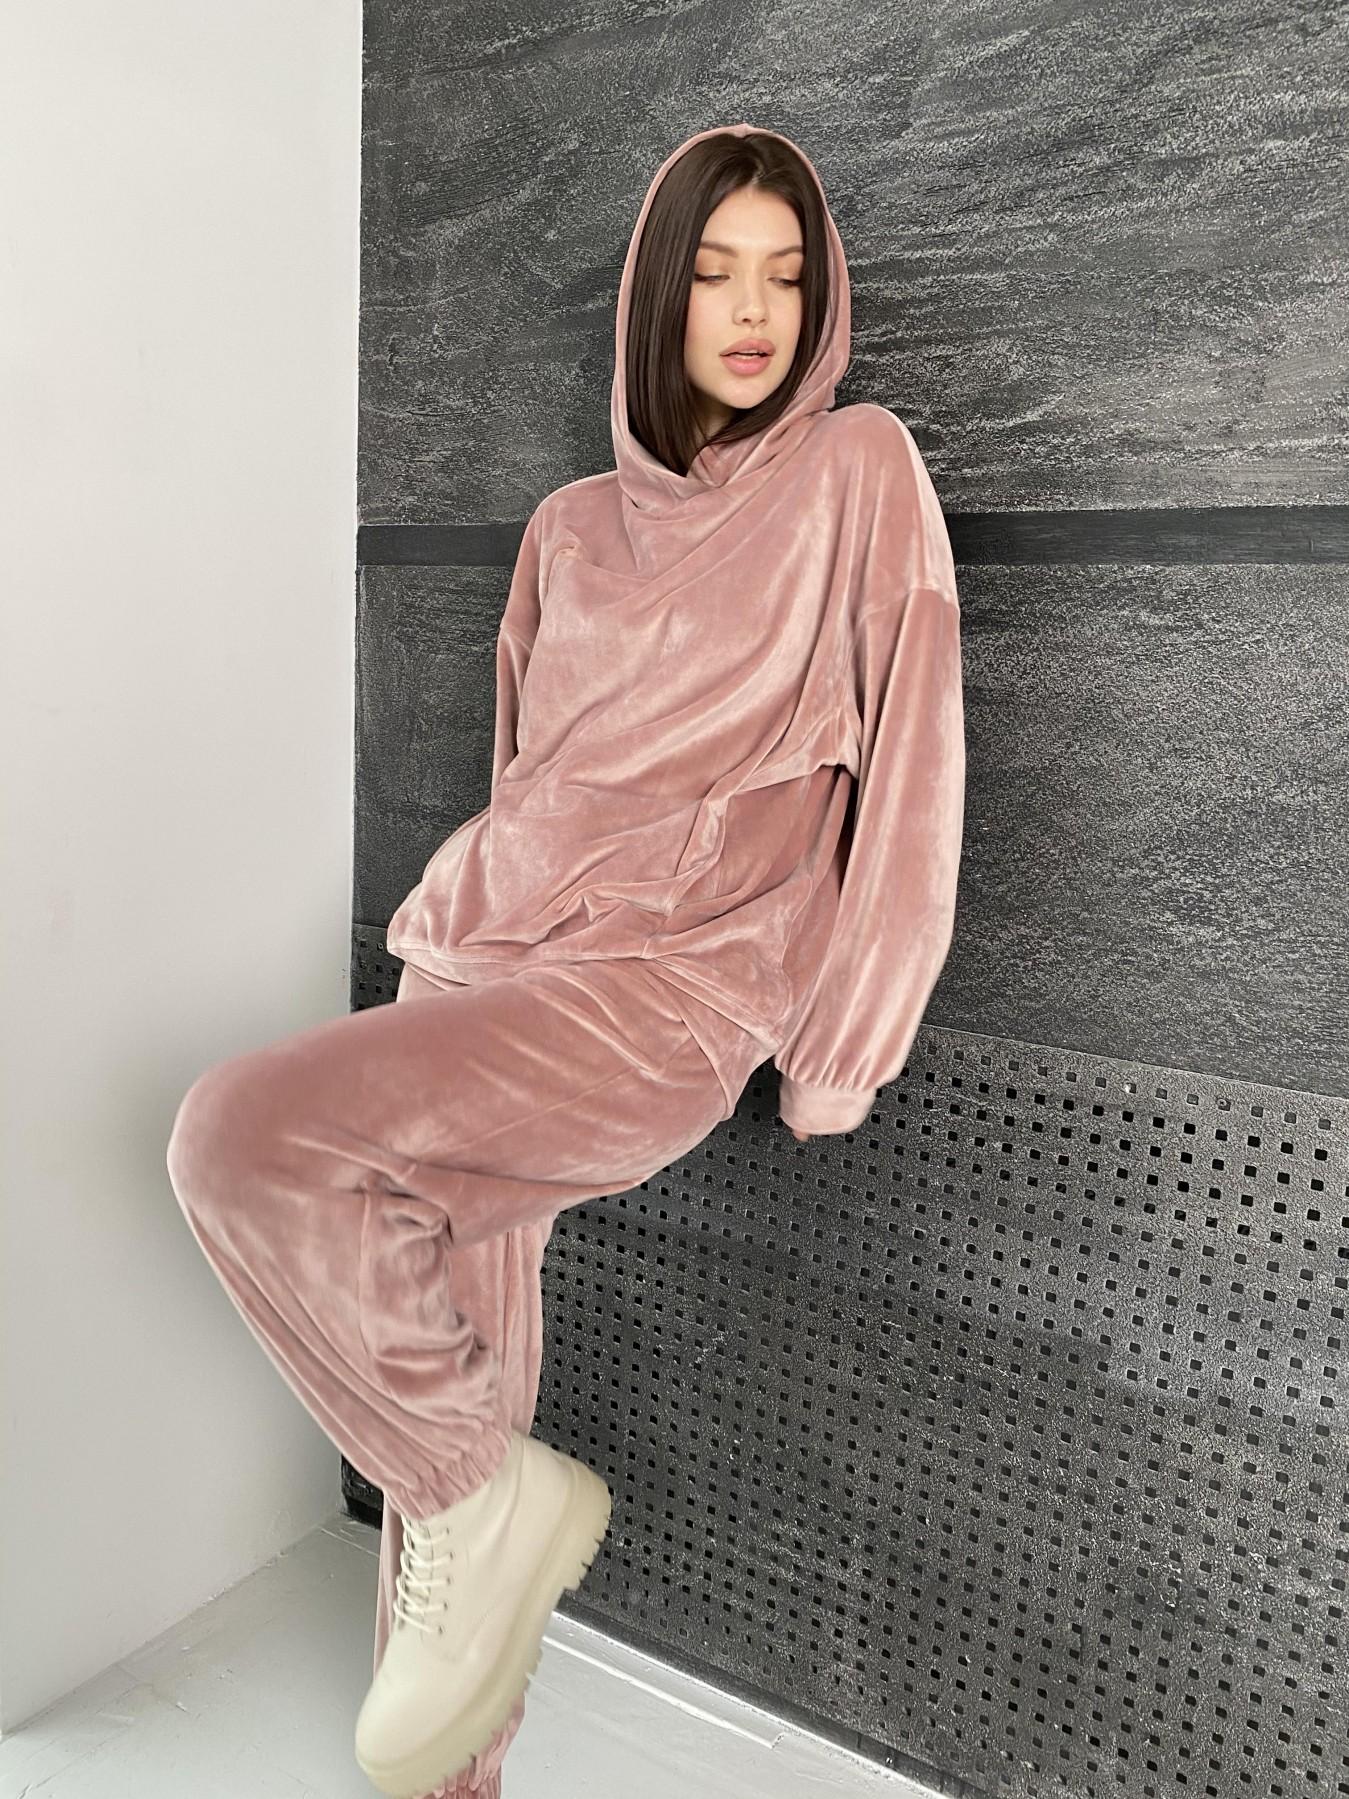 Марион Oversize  костюм из велюра 10690 АРТ. 47112 Цвет: Пудра - фото 5, интернет магазин tm-modus.ru